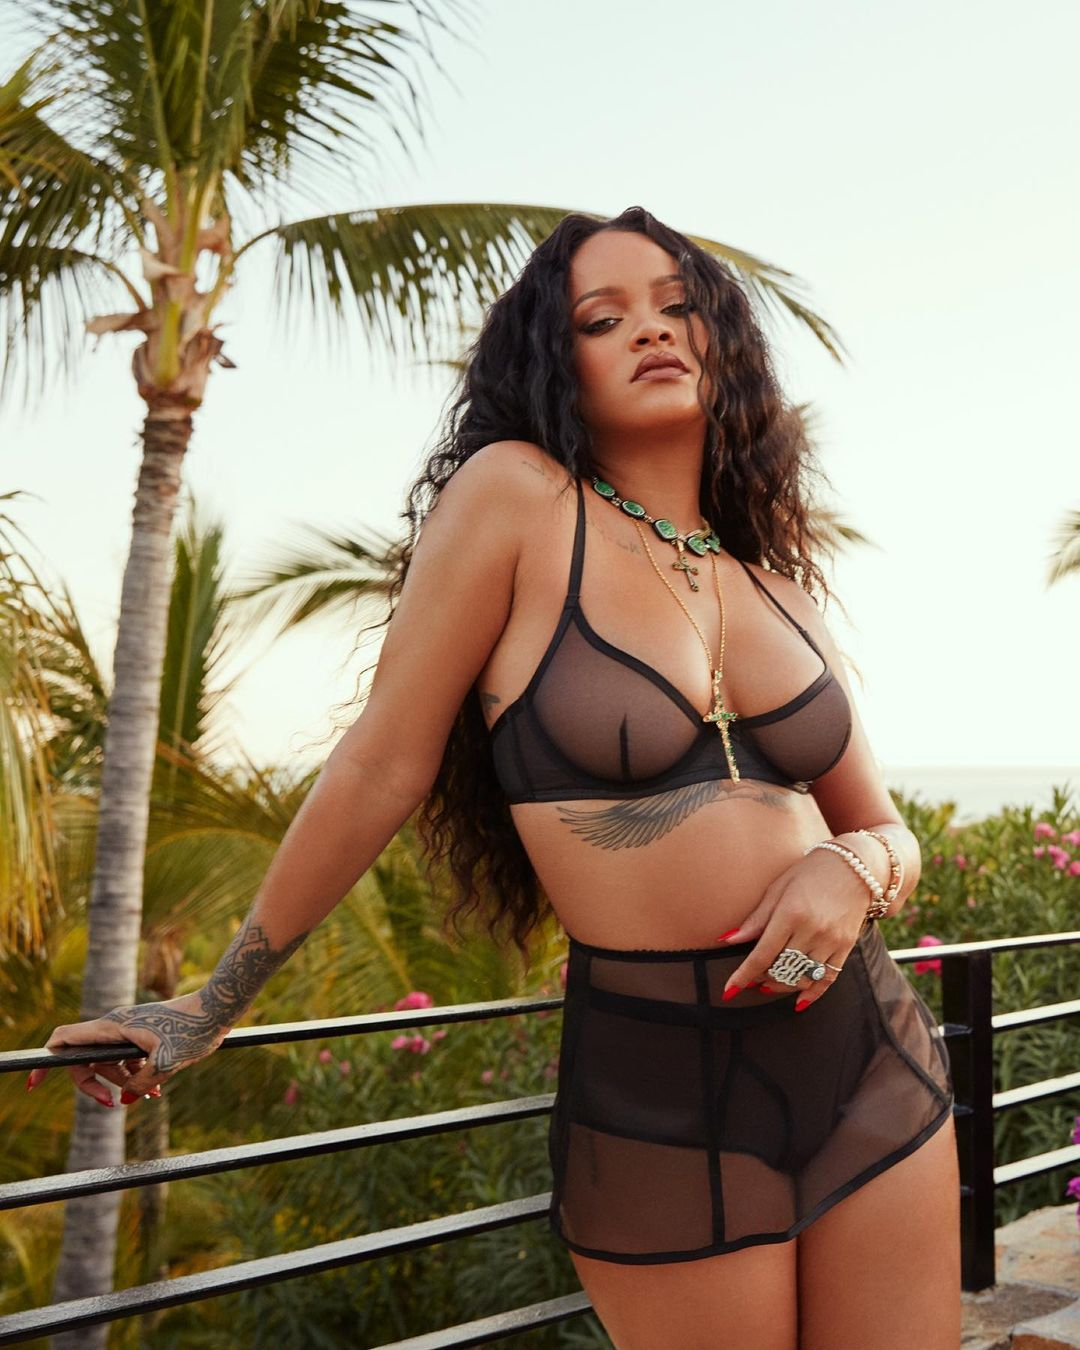 Deretan Gaya Seksi Rihanna Pakai Lingerie, Menghebohkan Media Sosial